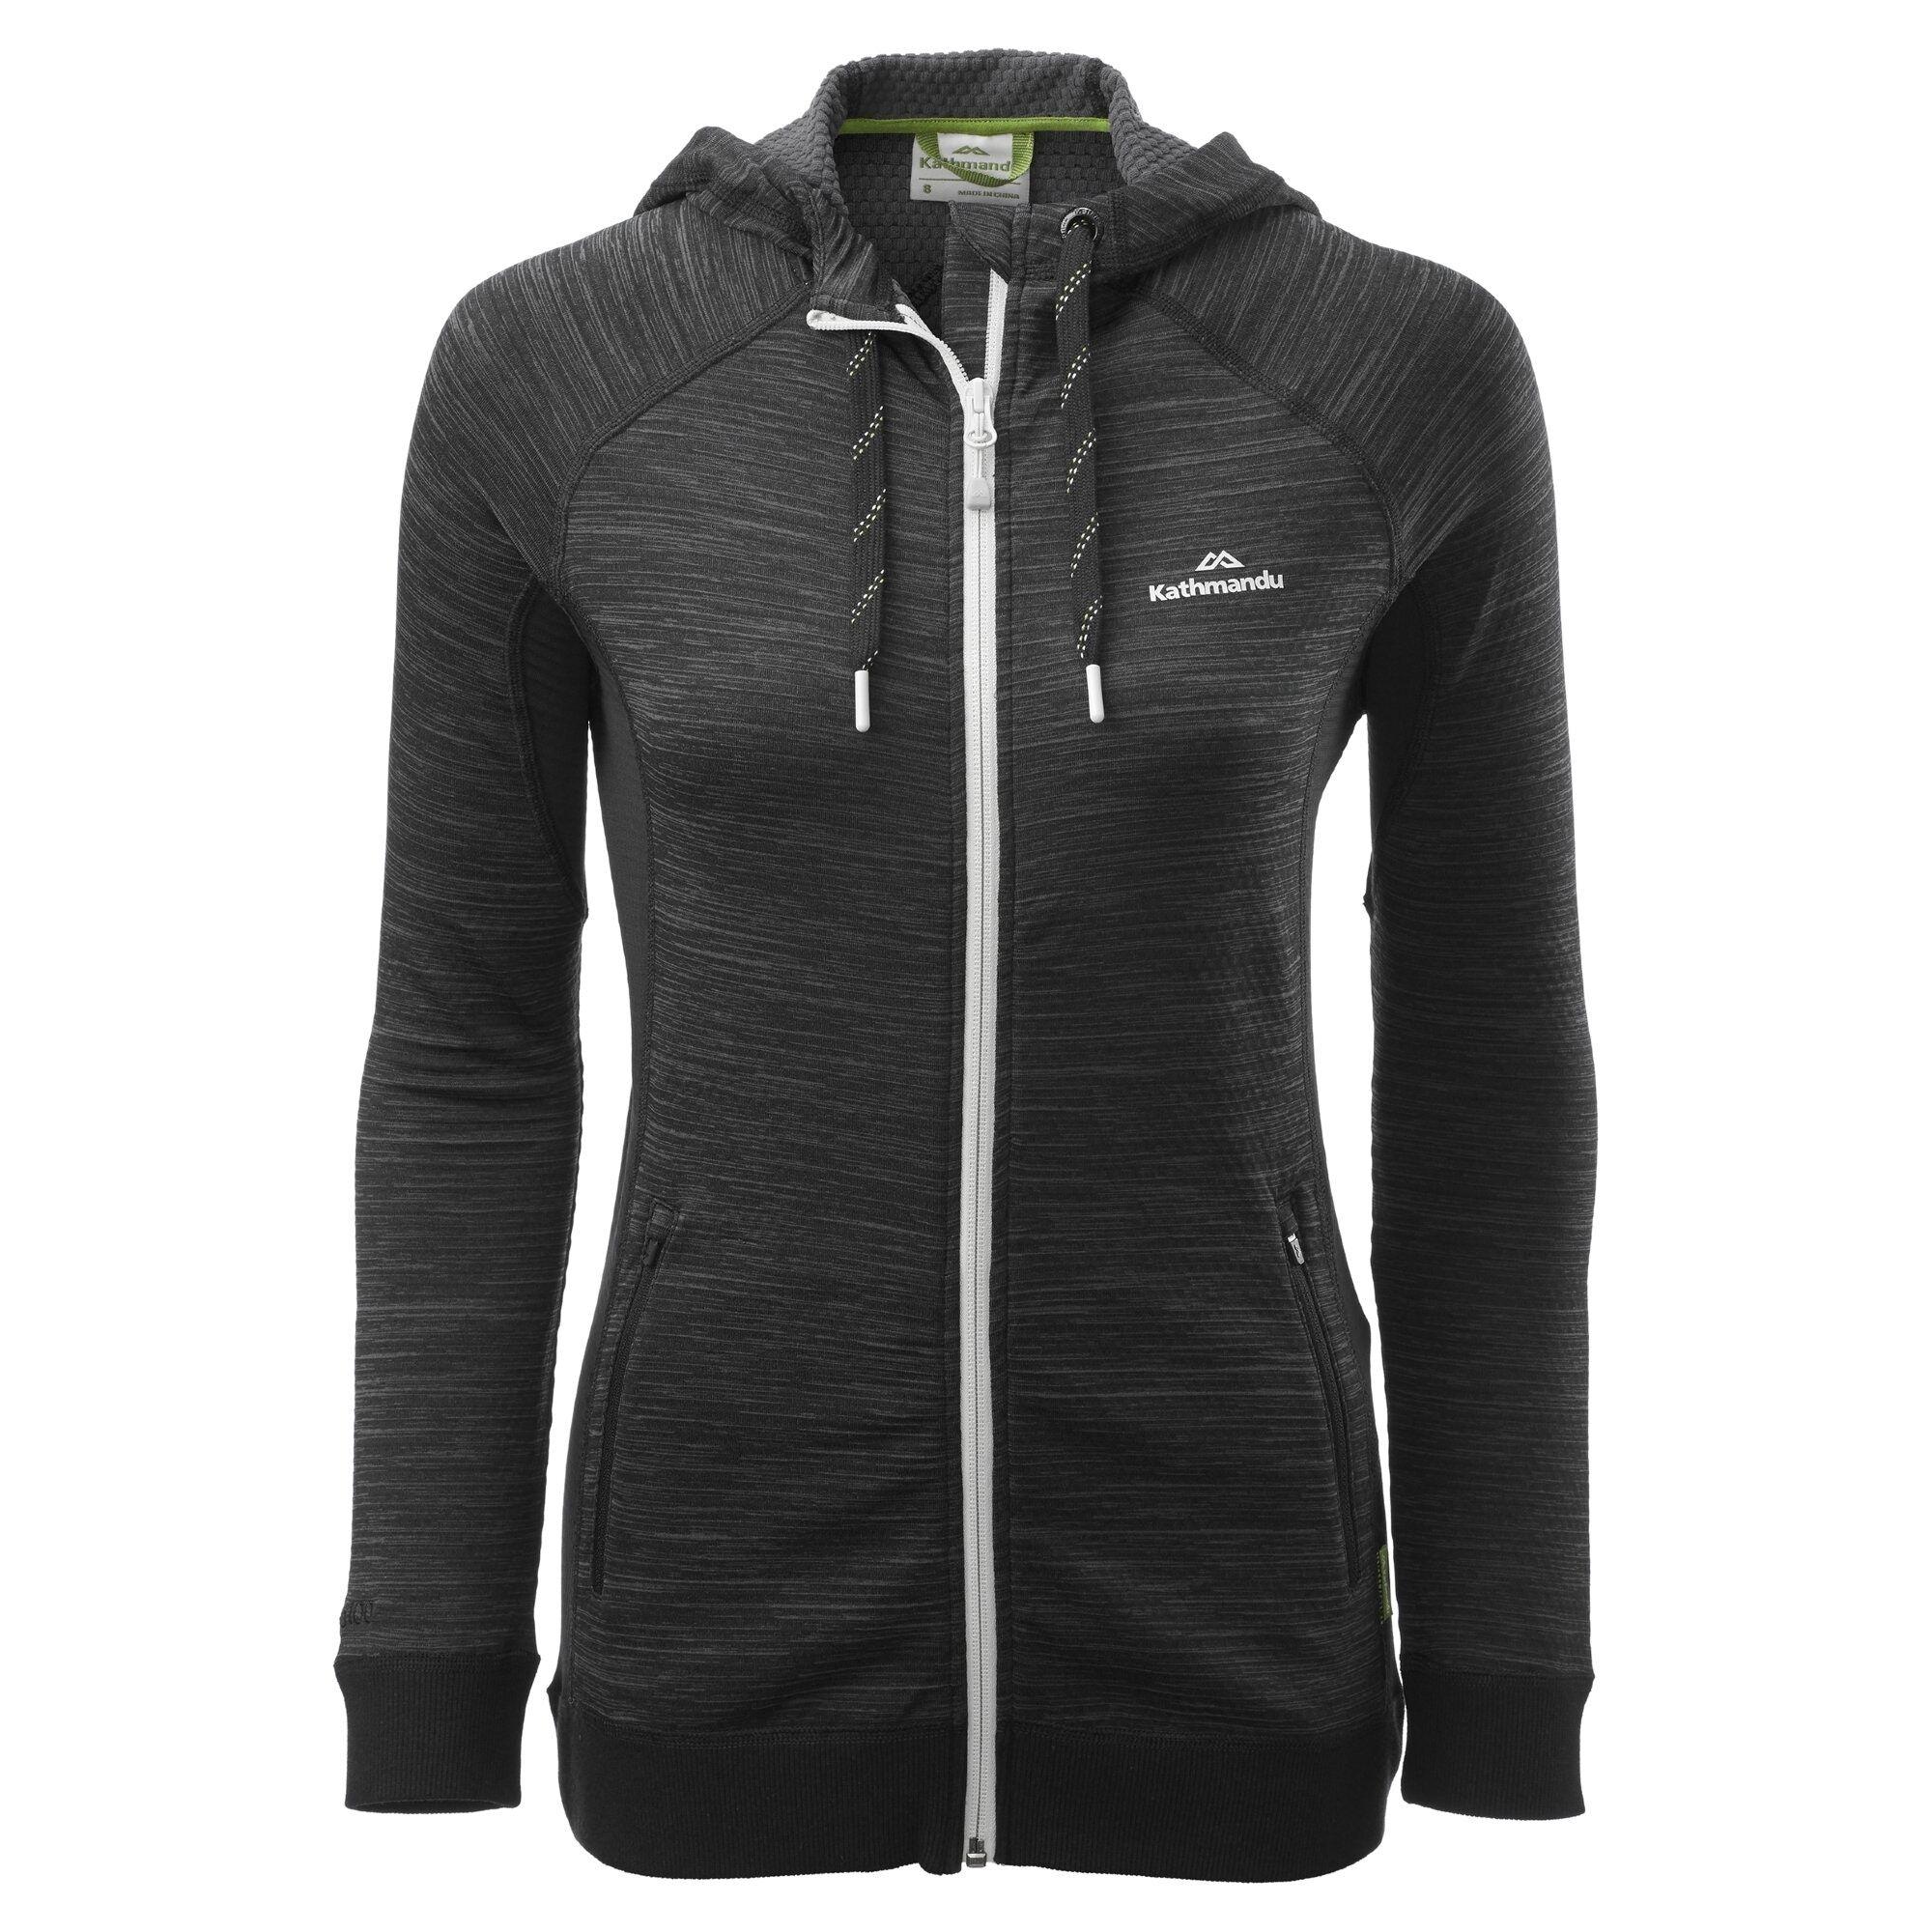 Kathmandu Acota Women's Hooded Fleece Jacket  - Granite Marle/Black - Size: US 8